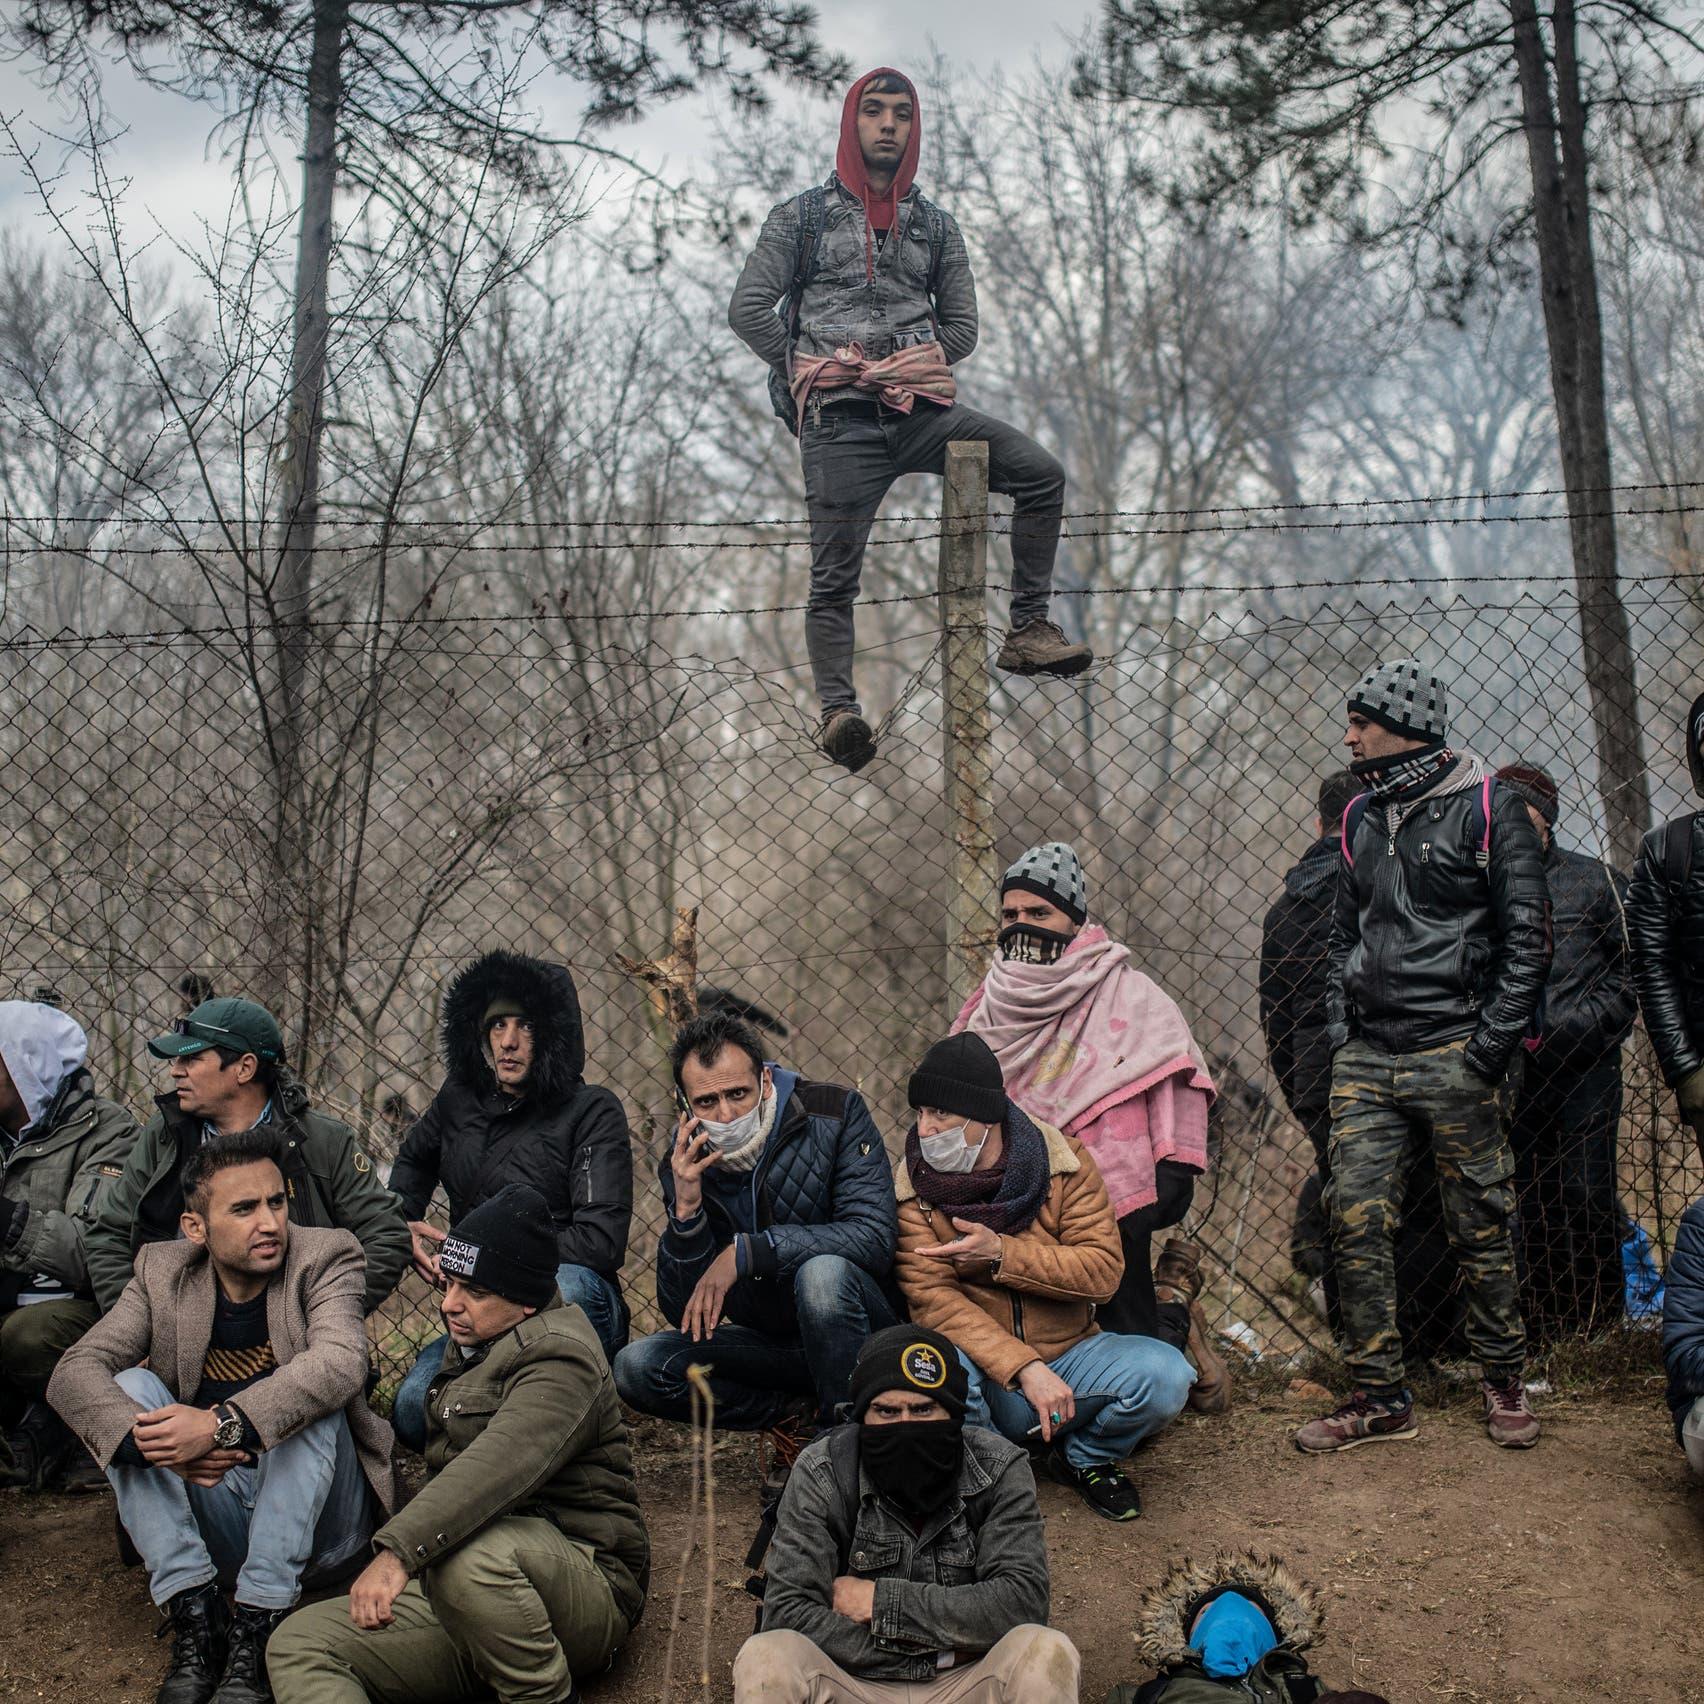 EU considers $4.18 billion migrant funding for Turkey: Diplomats